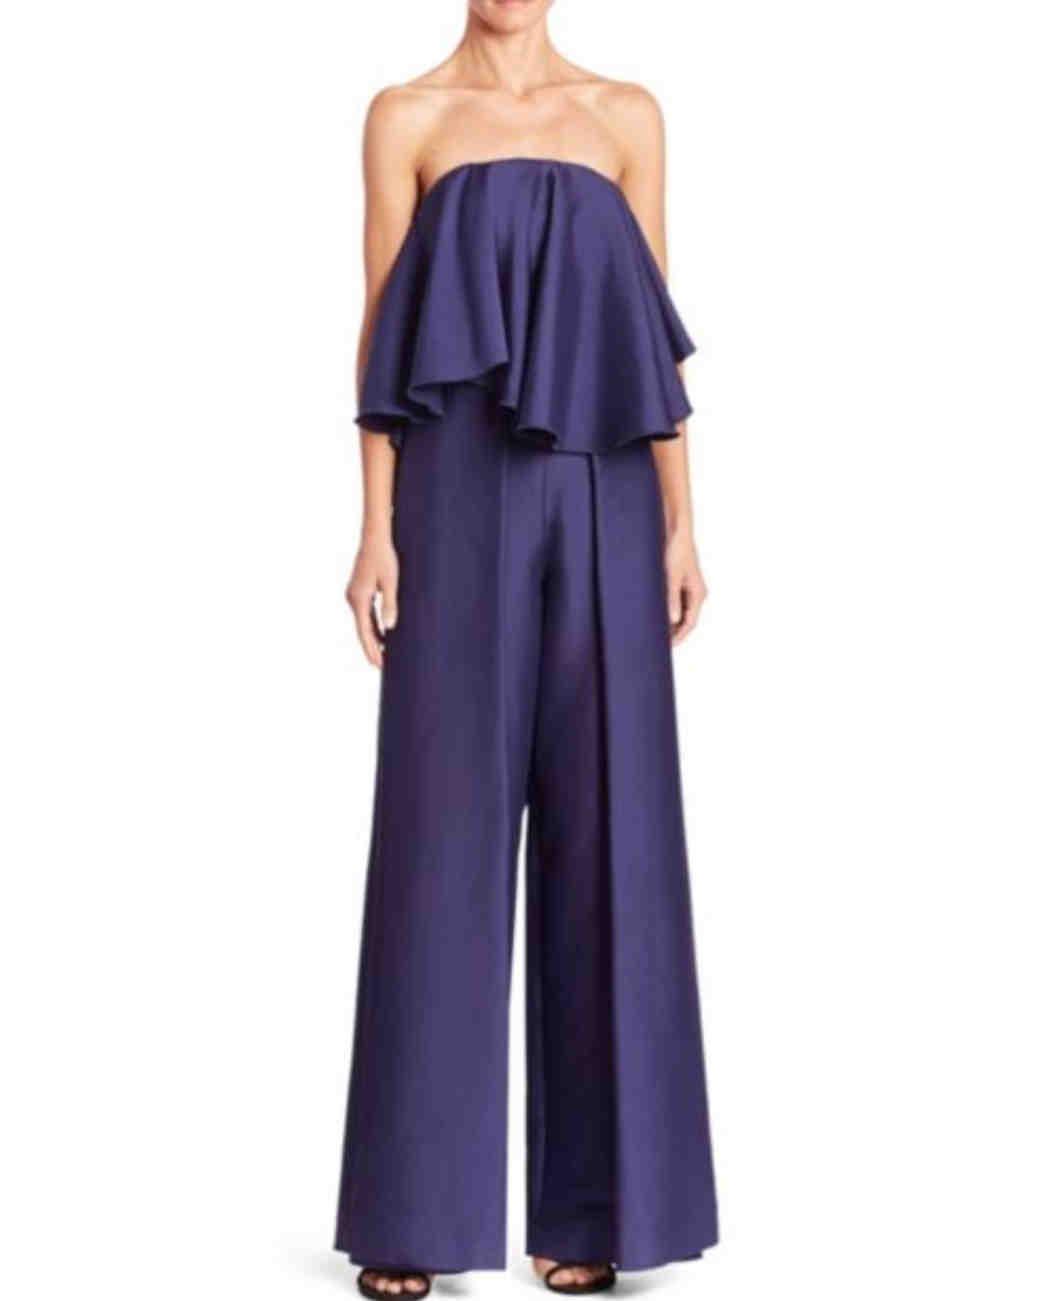 26 Chic Bridesmaid Jumpsuits | Martha Stewart Weddings